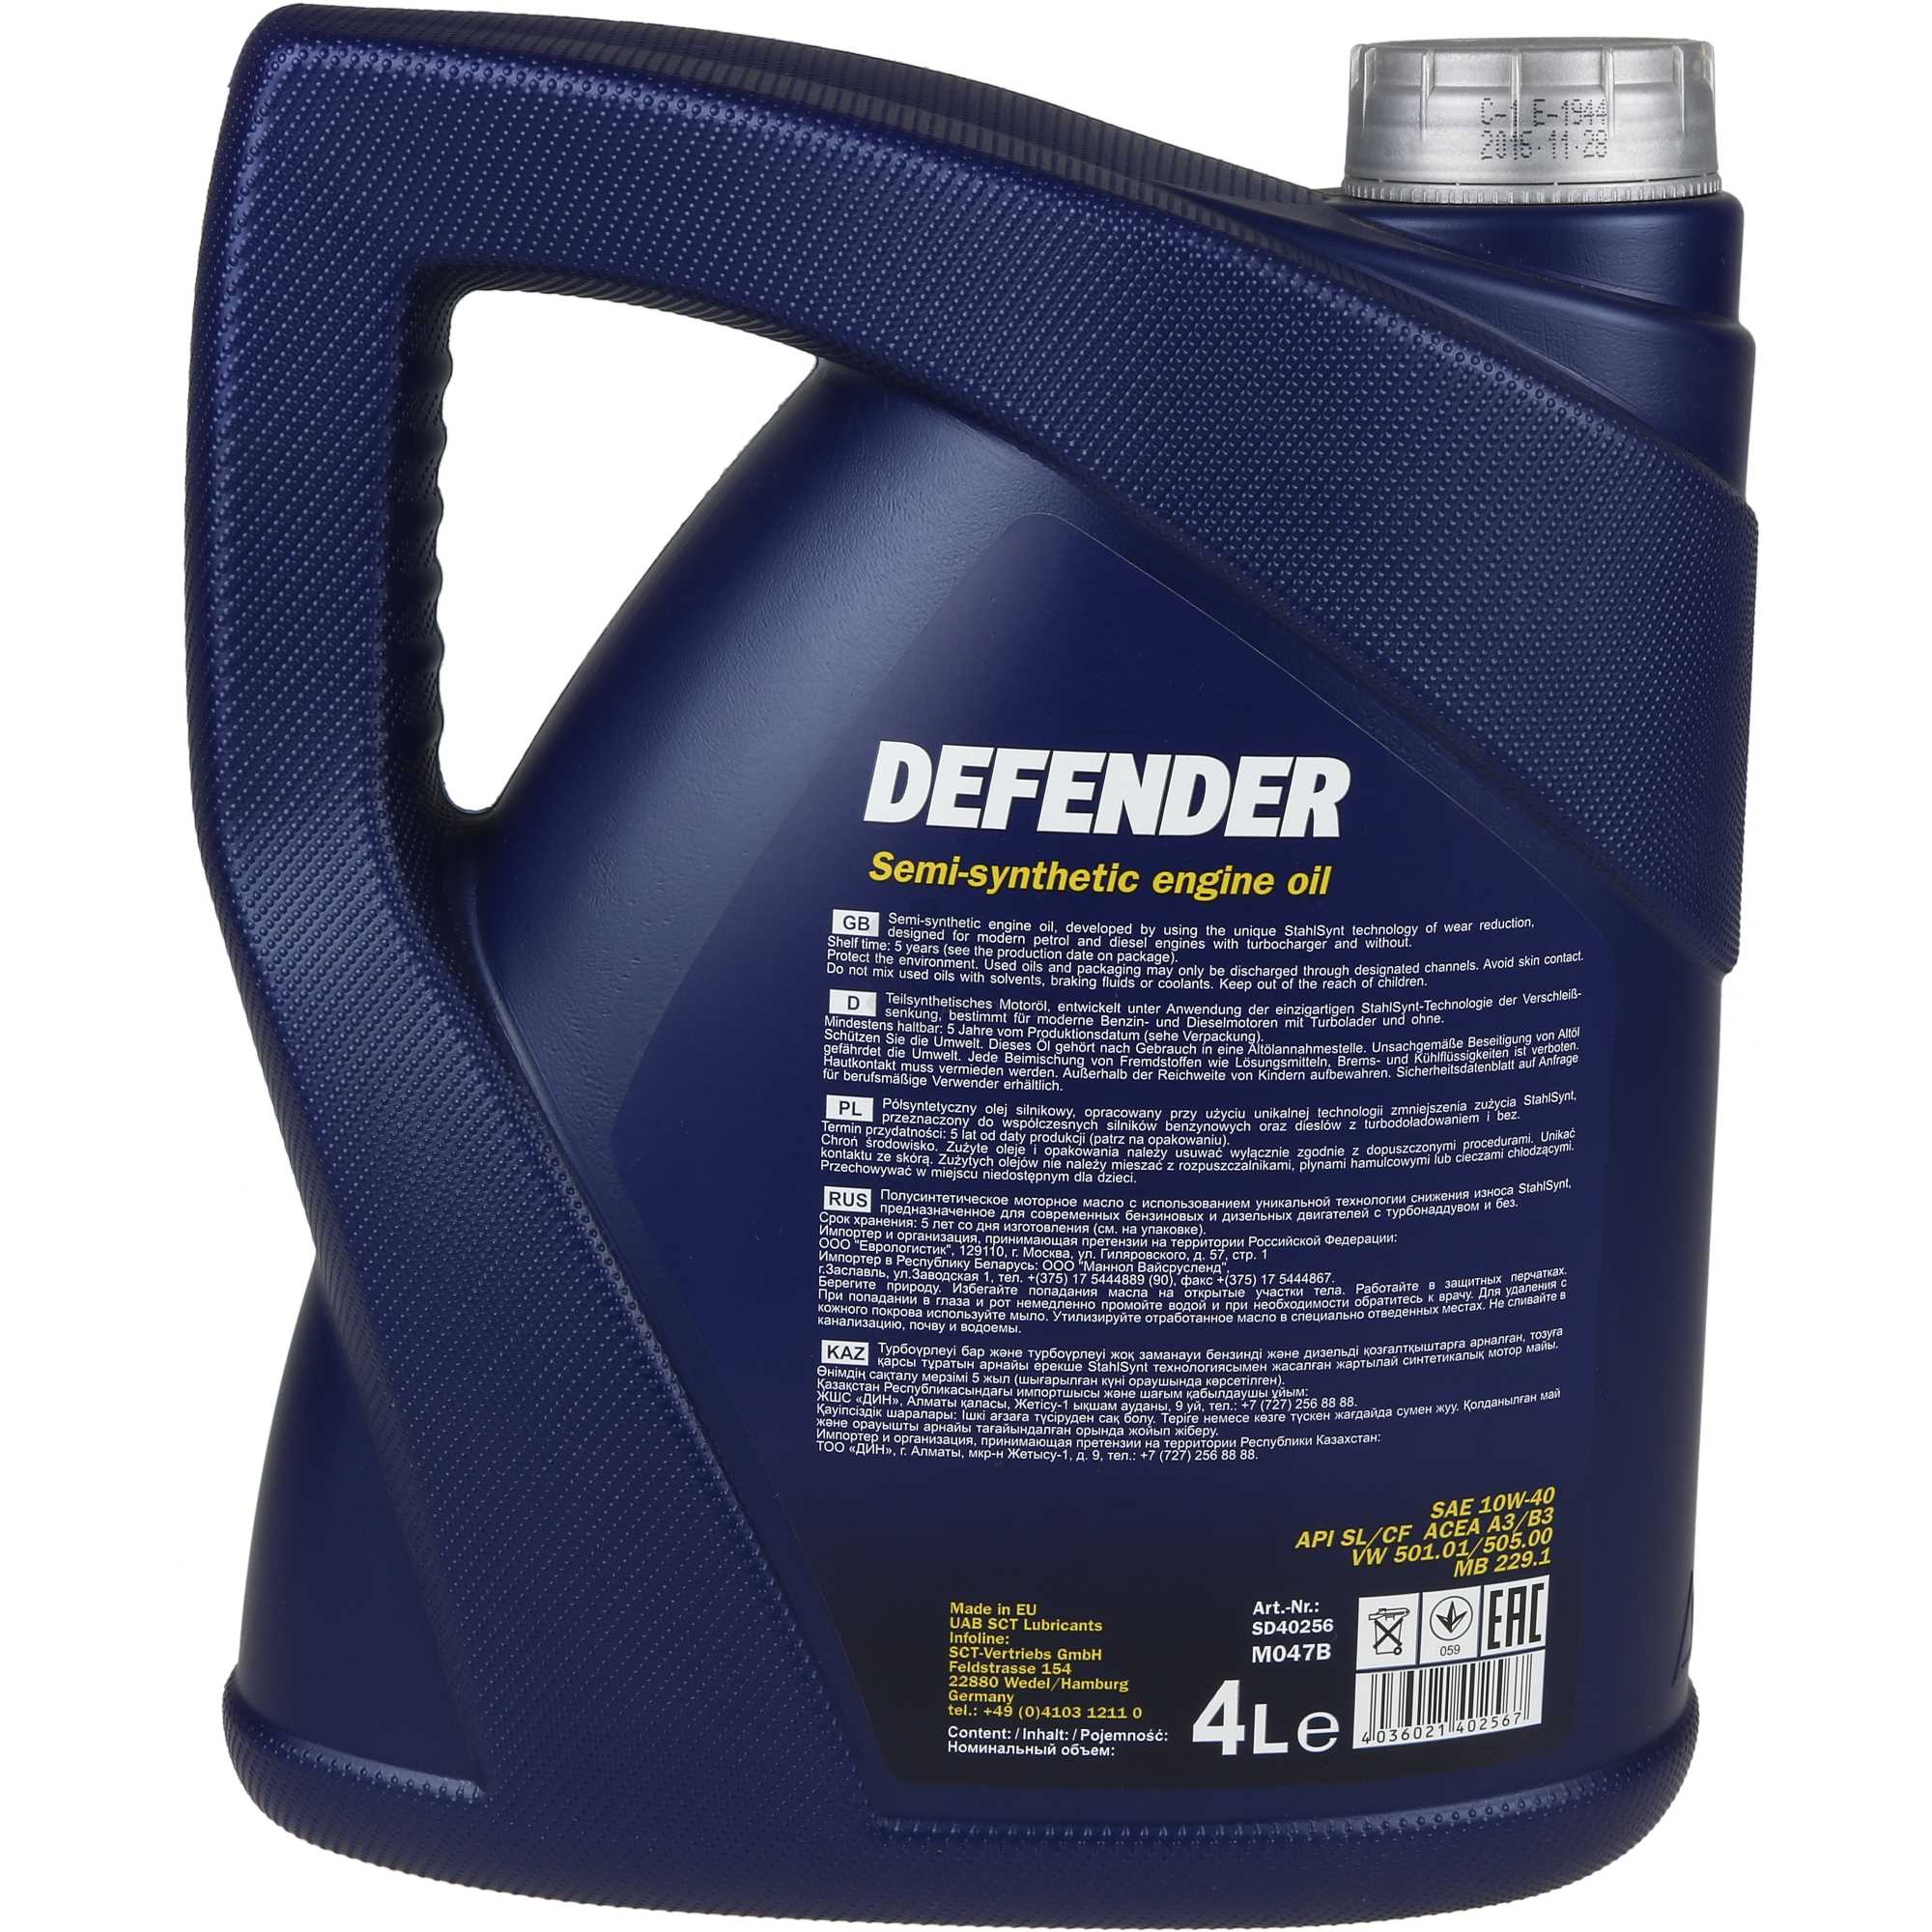 Aceite-del-motor-aceite-5w40-10w40-15w40-5w30-10w60-1l-4l-5l-7l-10l-20l miniatura 11